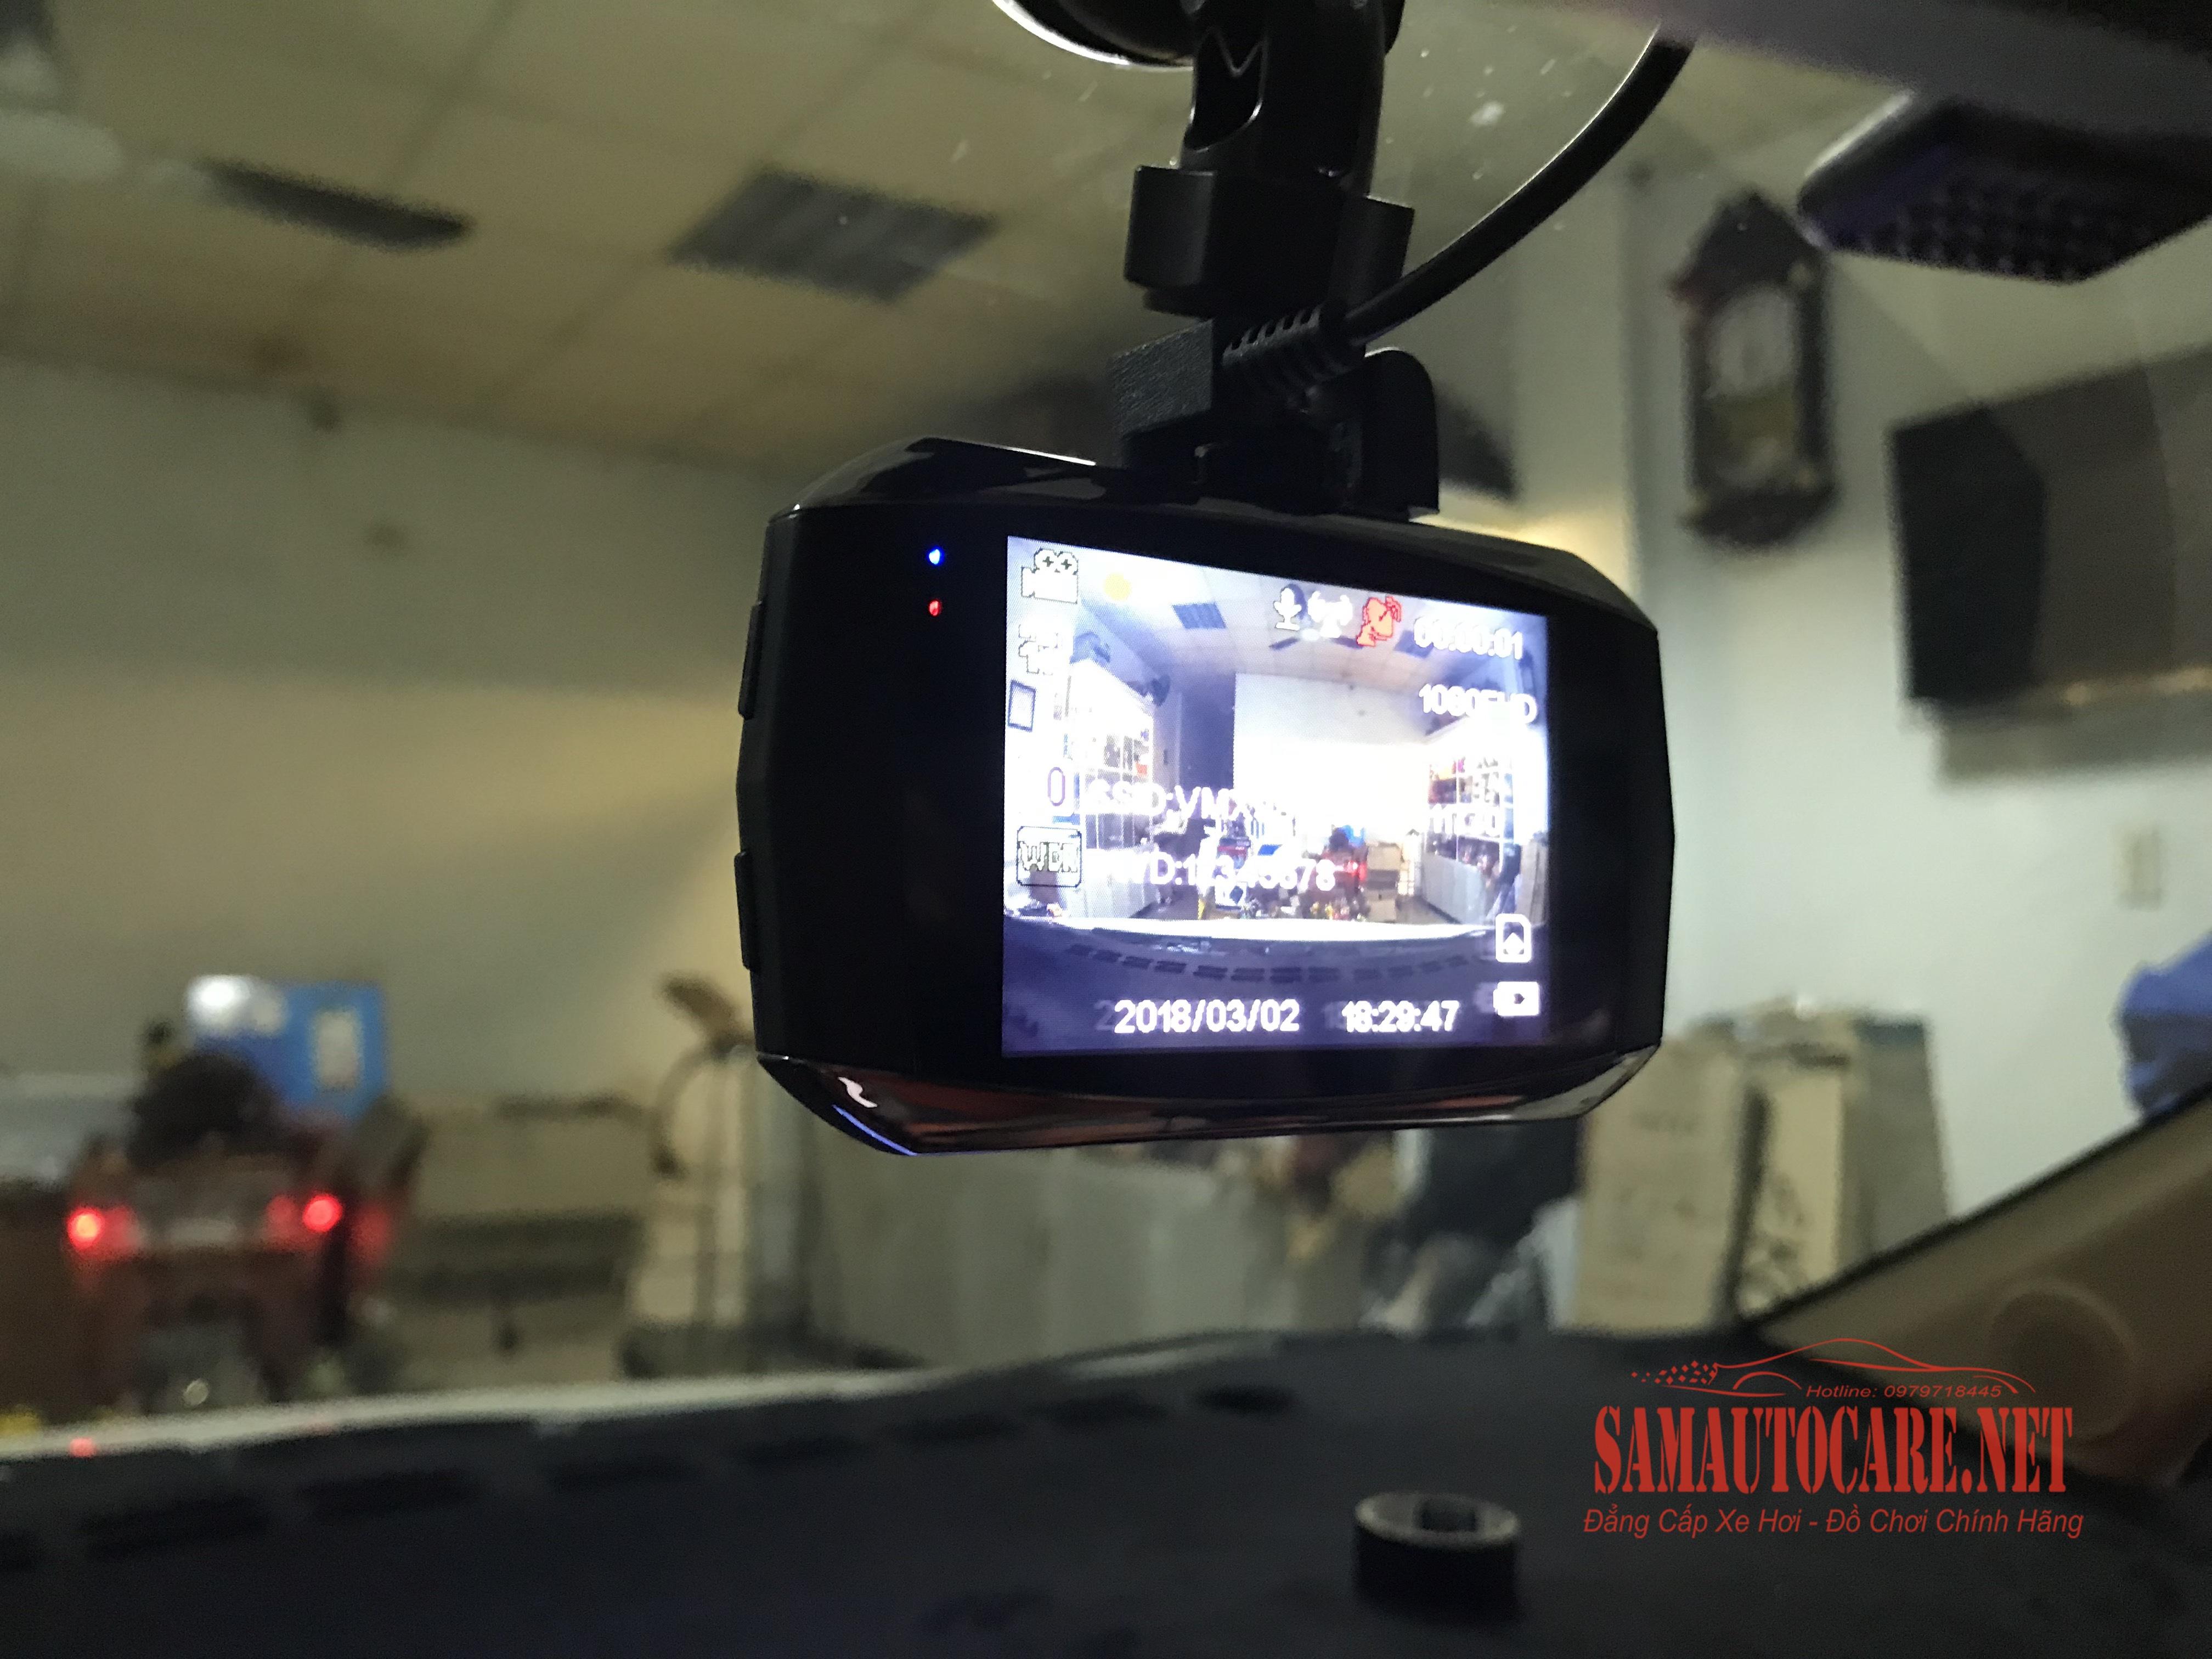 Camera Hành Trinh Vietmap X9S Vios 2018